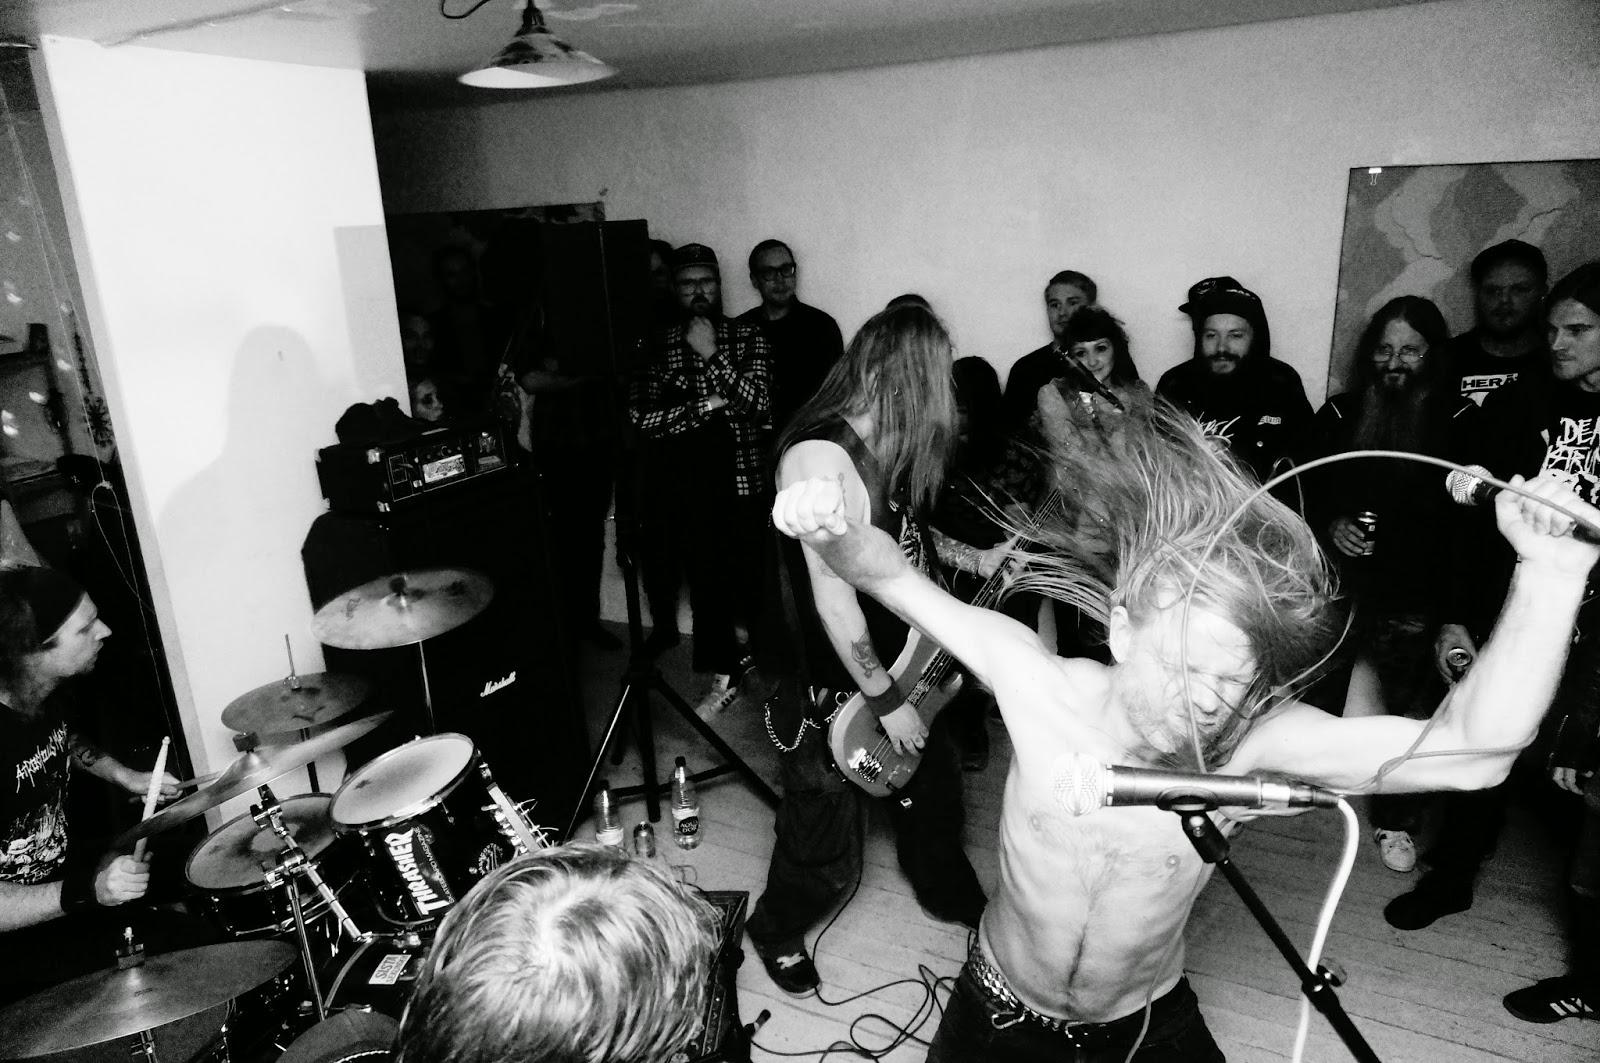 fest oskuld hardcore i Malmö